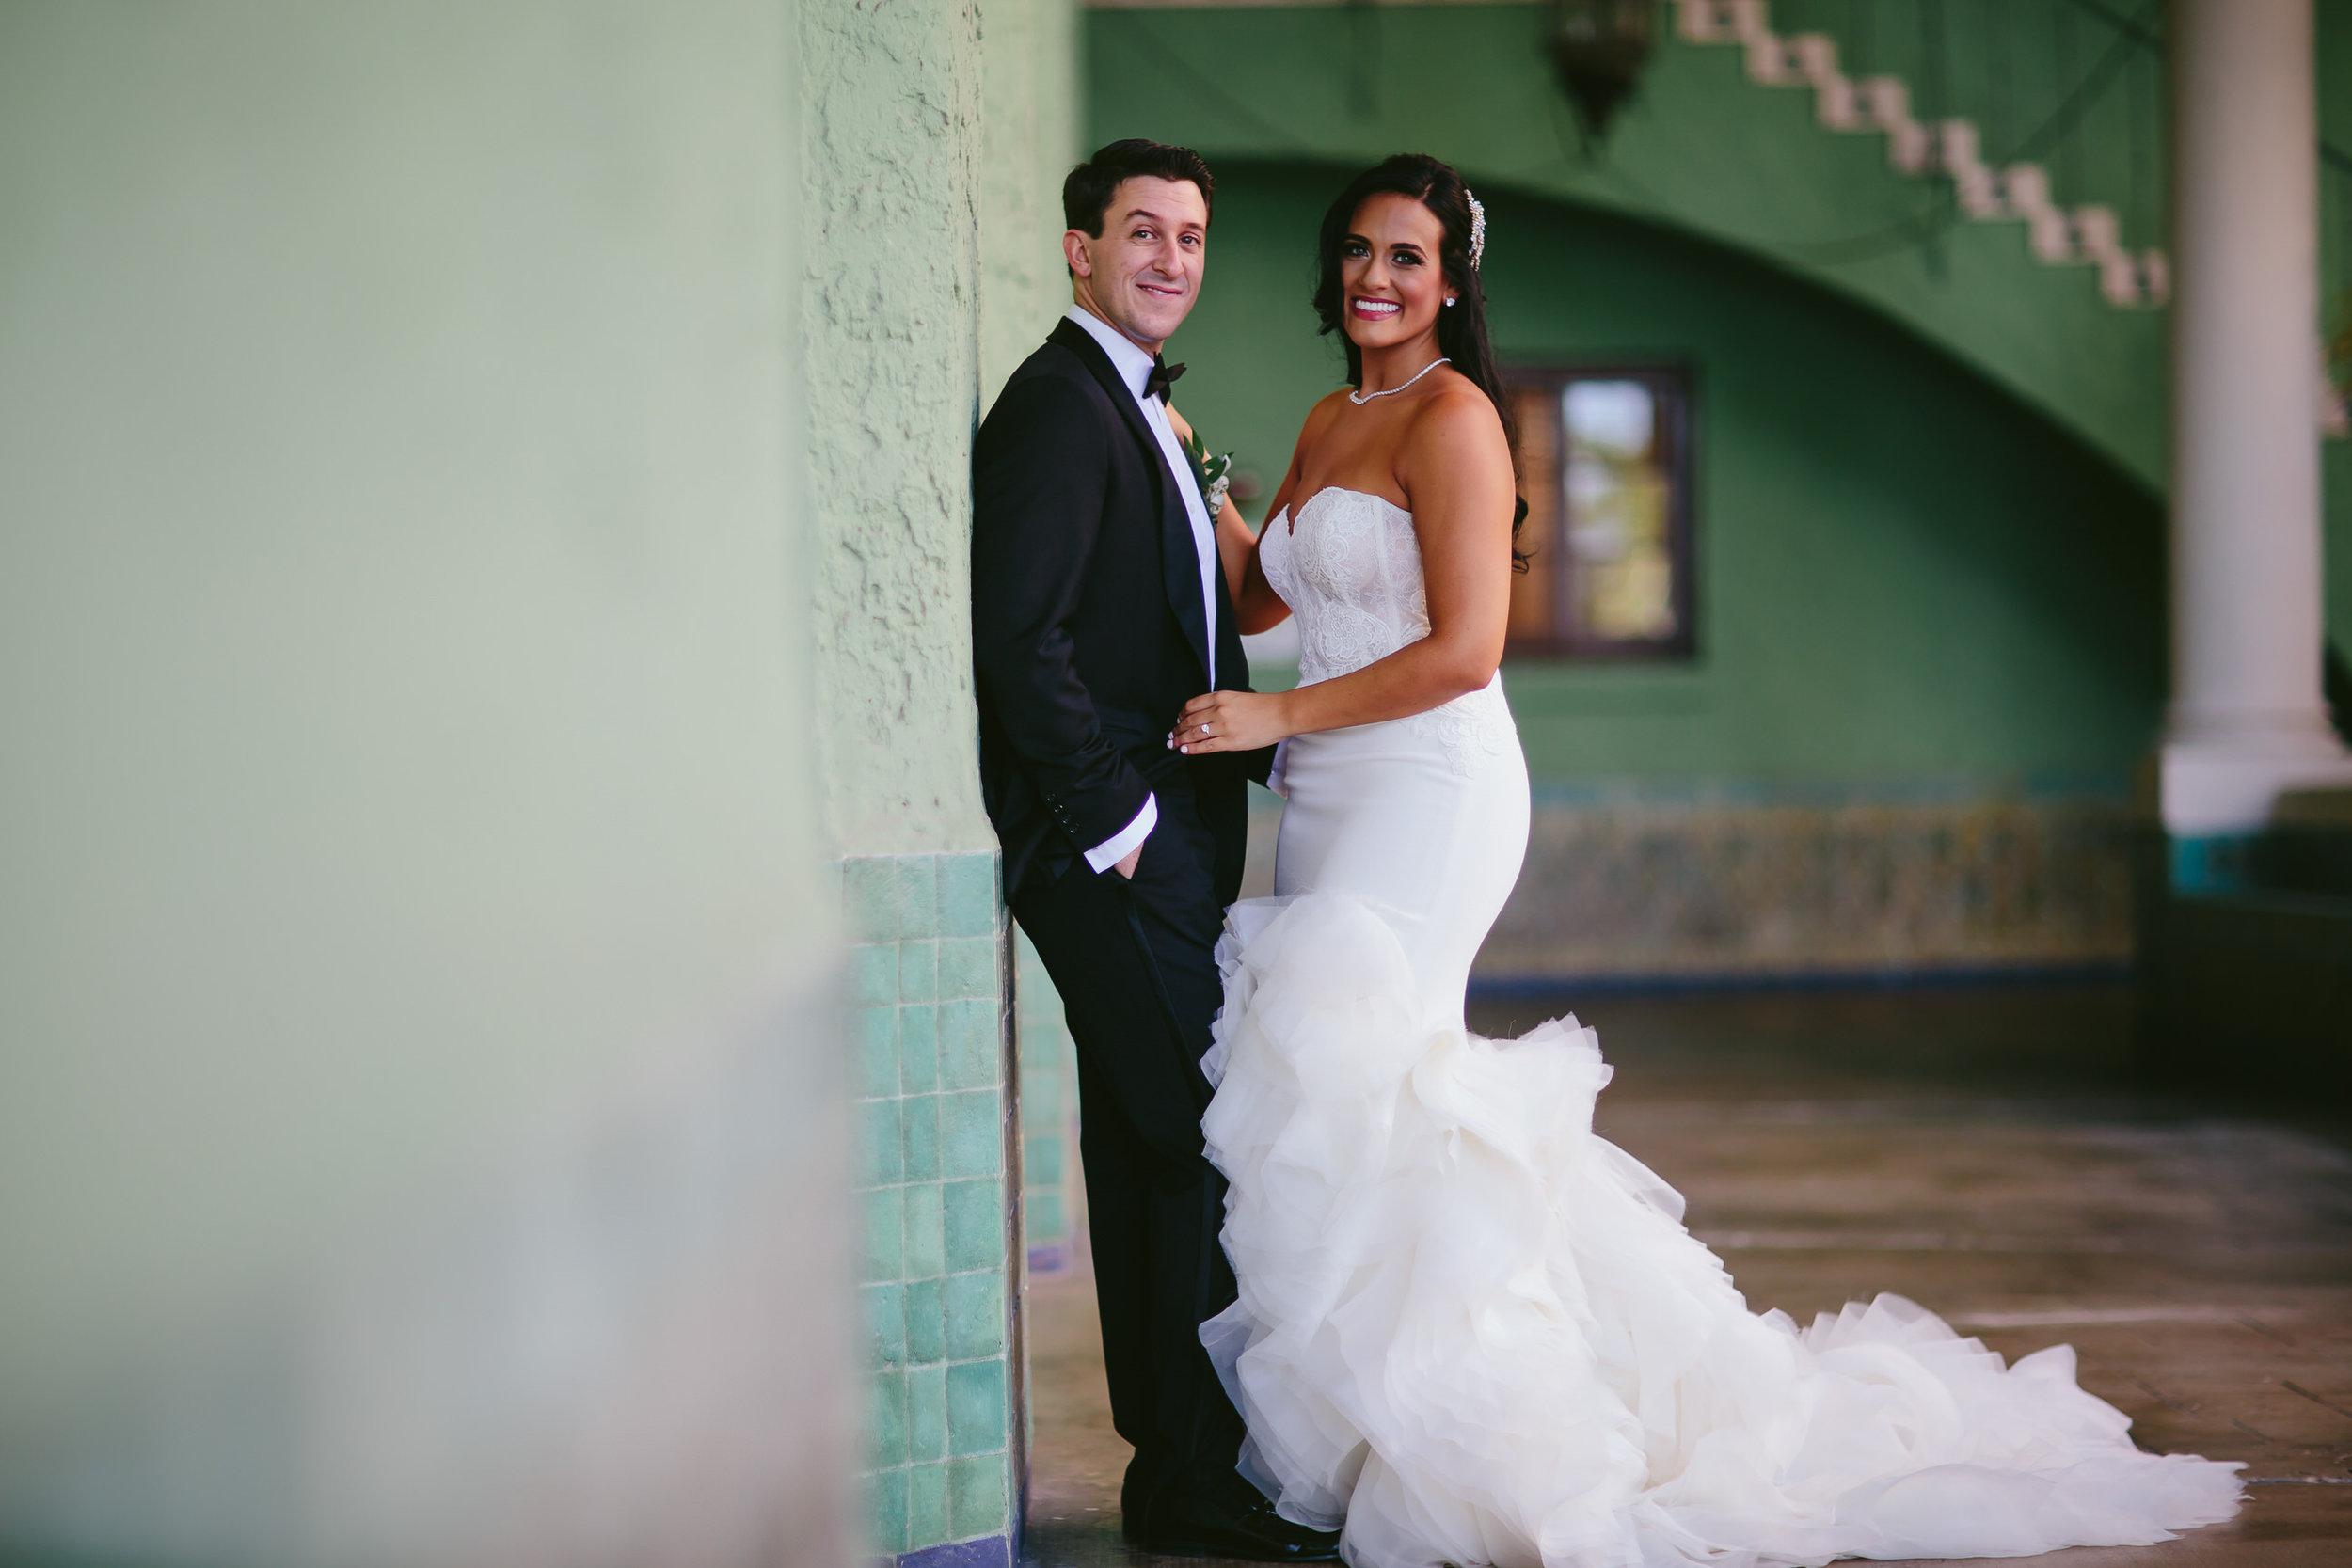 biltmore-wedding-steph-lynn-photo-photographer-bride-and-groom-10.jpg